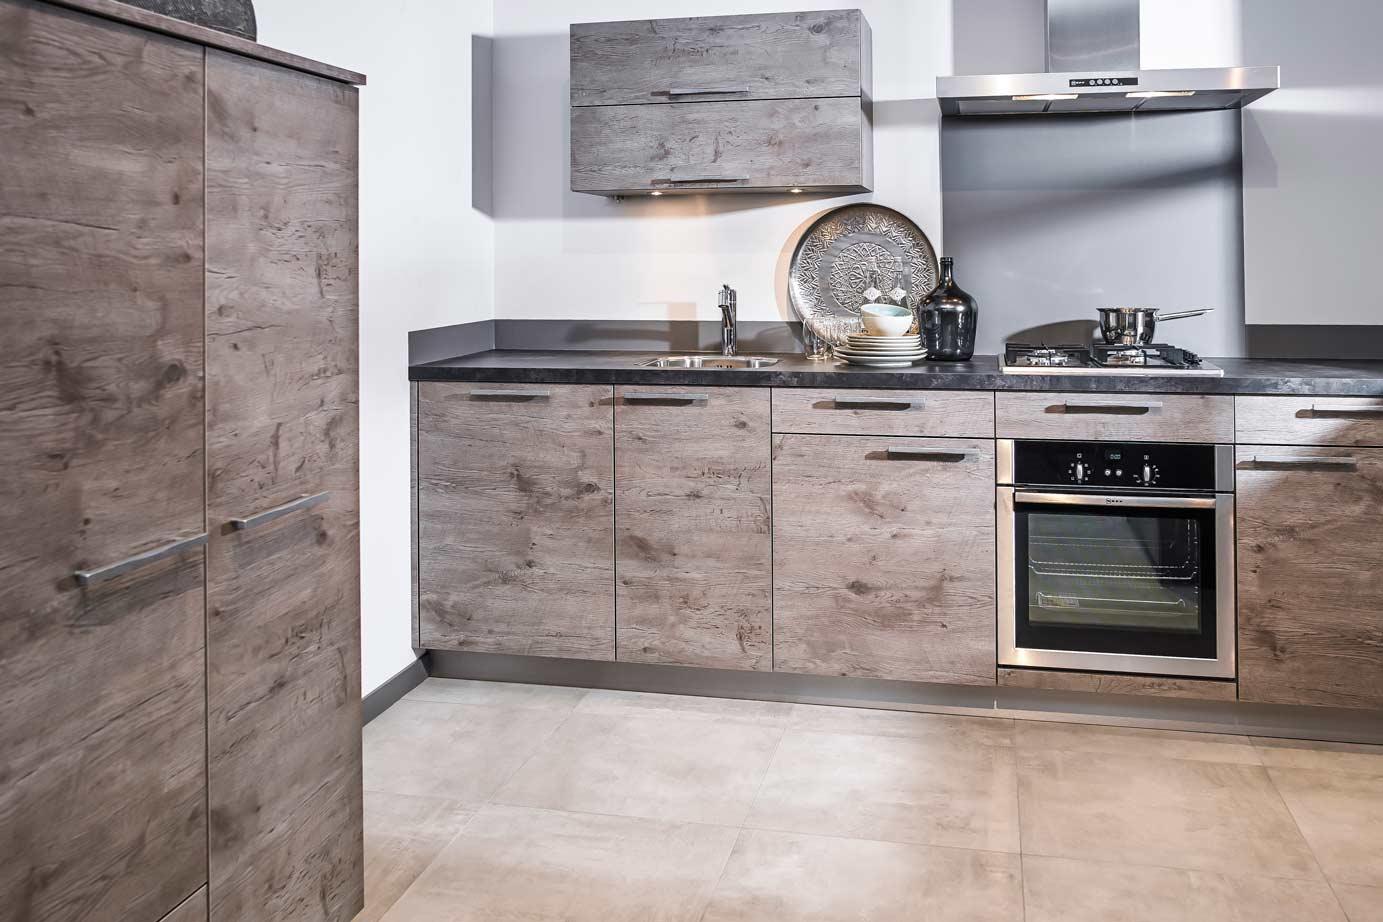 Keuken Moderne Klein : Moderne rechte keuken past in kleine keuken ruimte db keukens